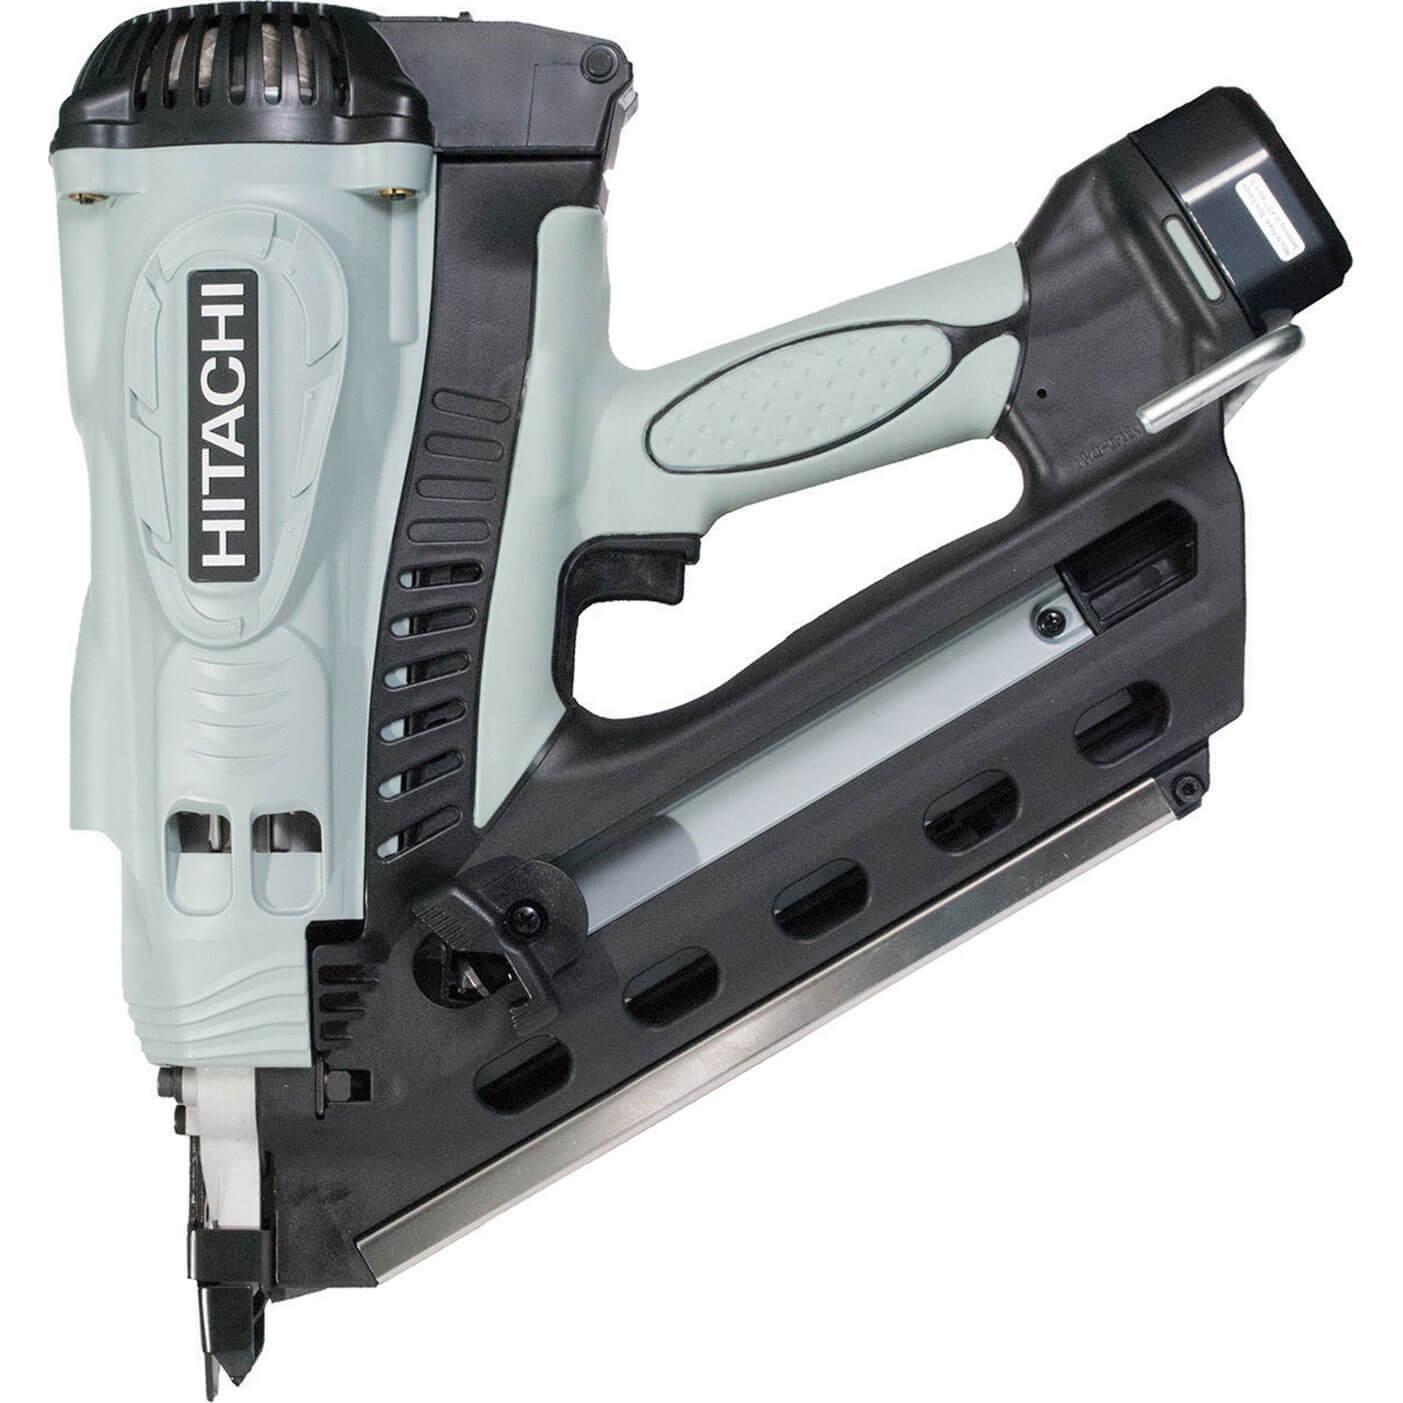 Hitachi NR90GC2 Cordless Gas Framing Nail Gun